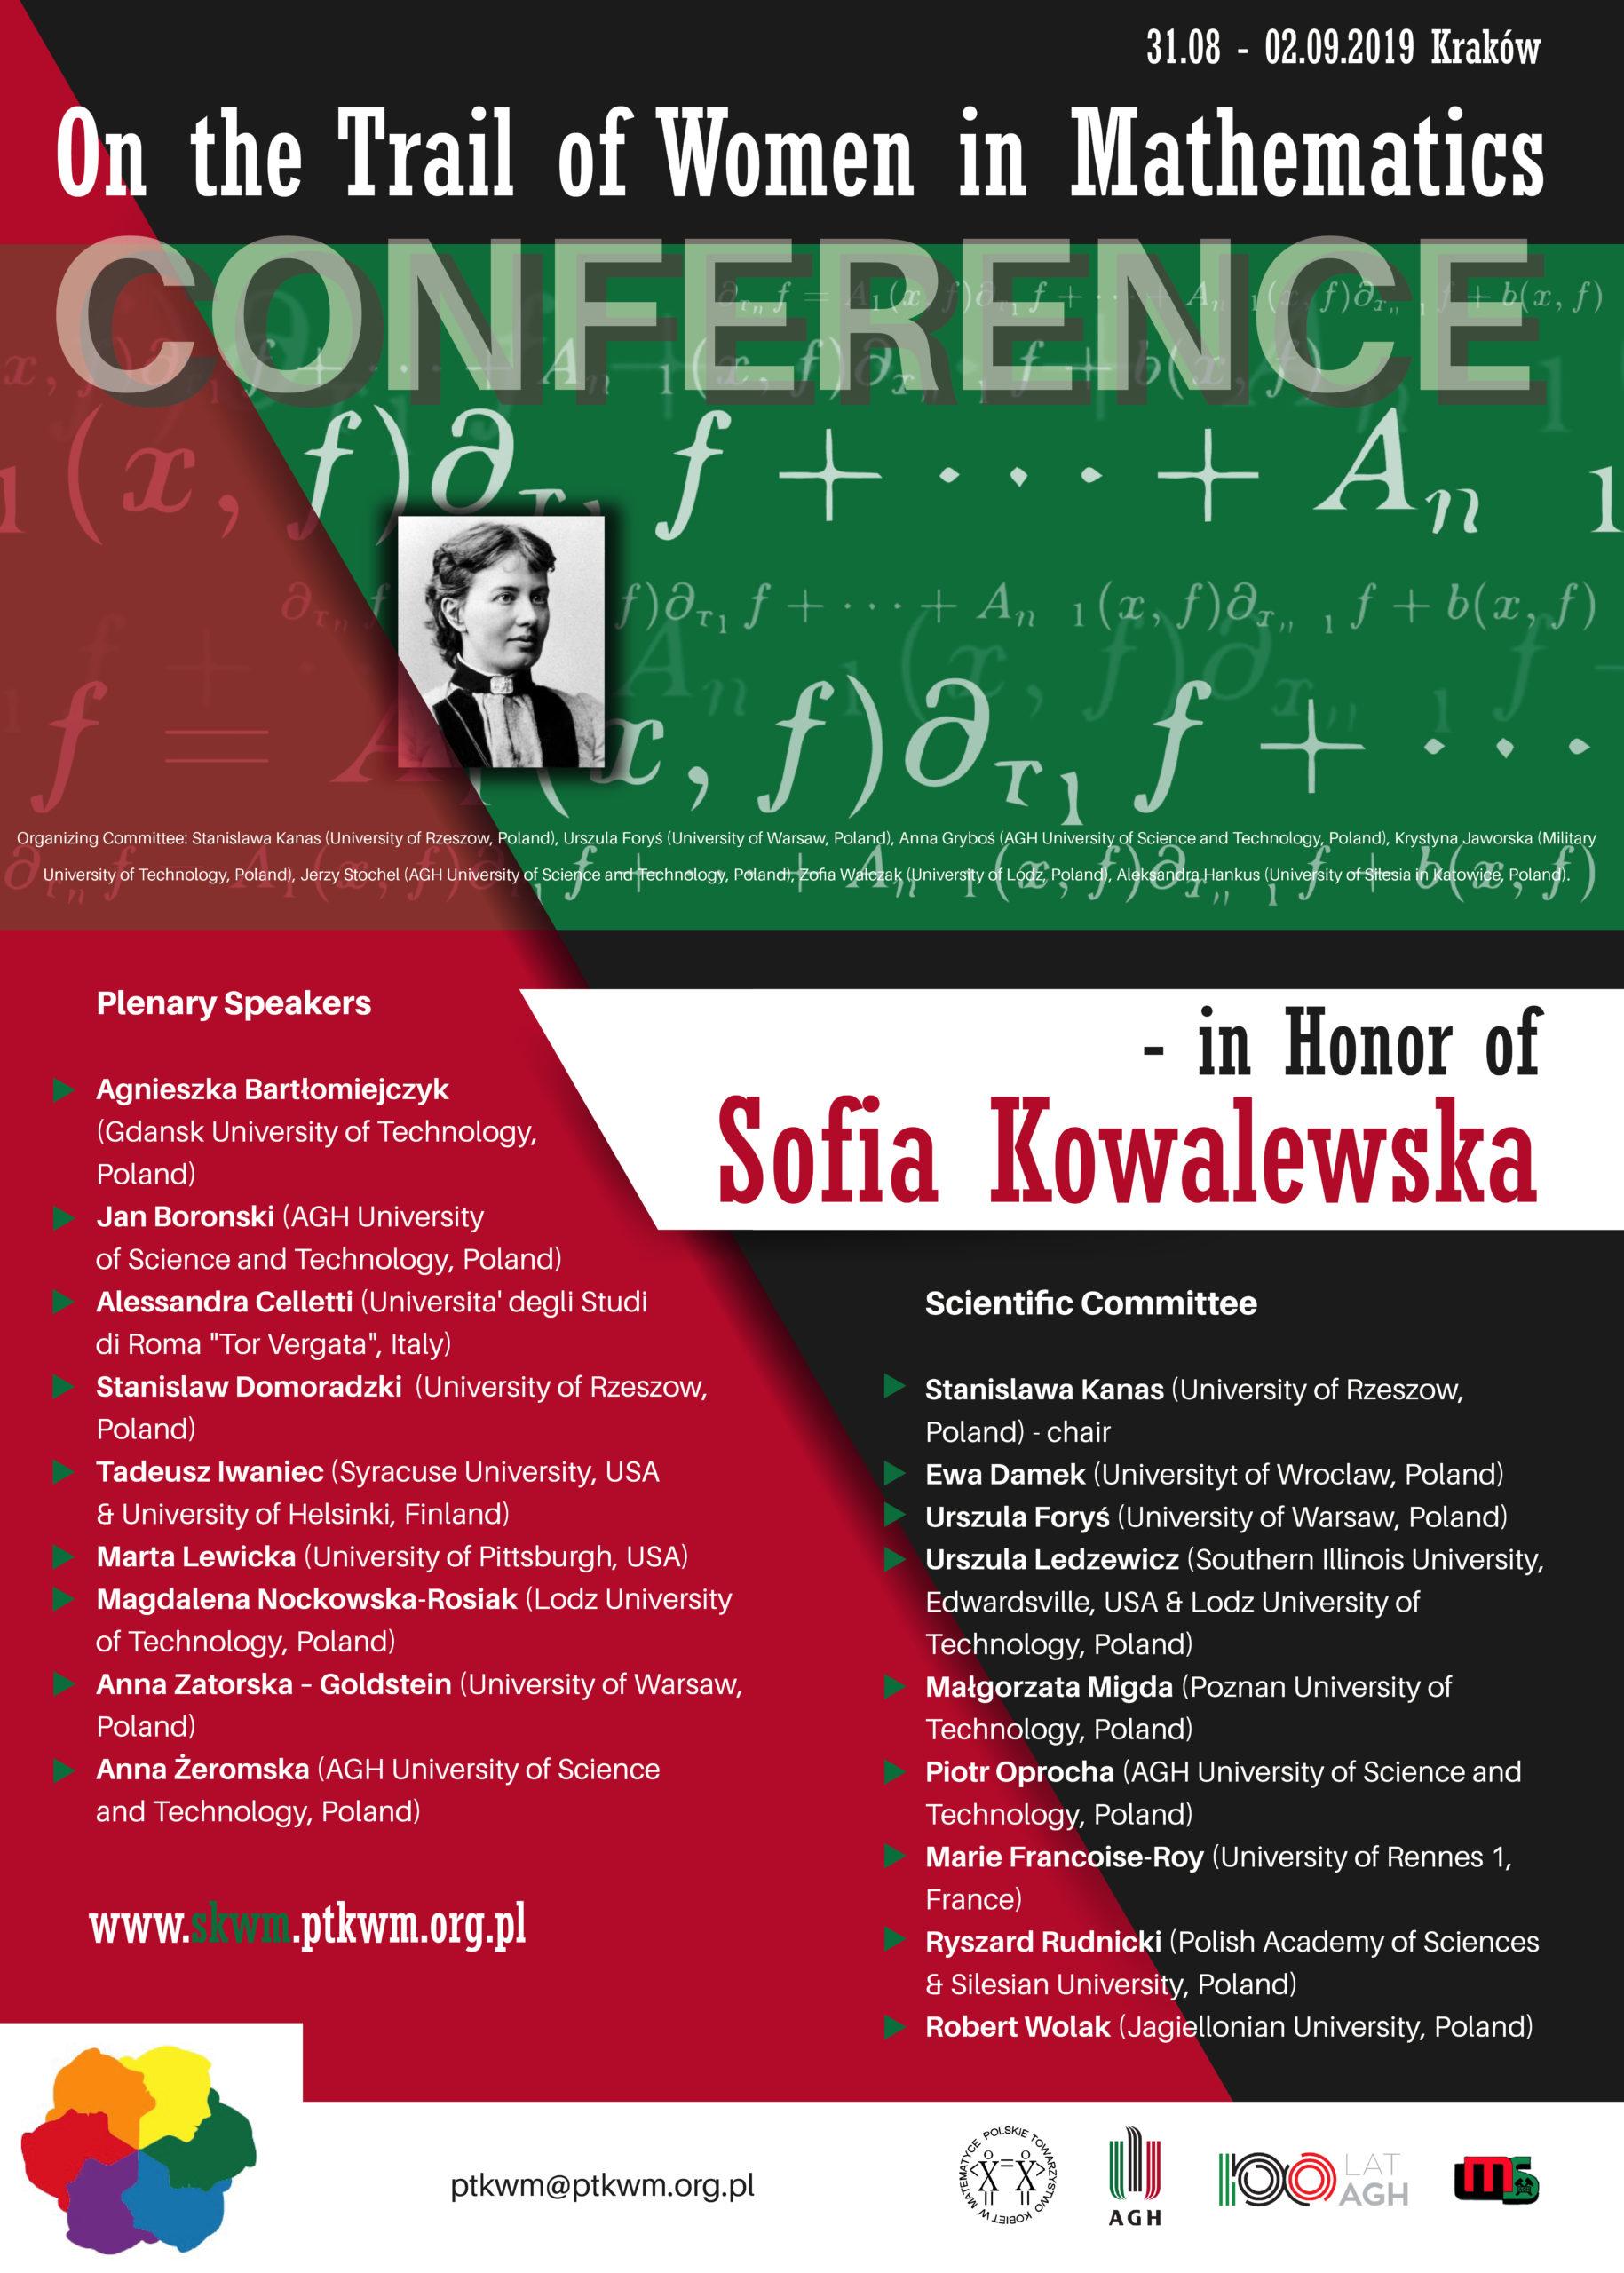 On the Trail of Women in Mathematics – in Honor of Sofia Kowalewska